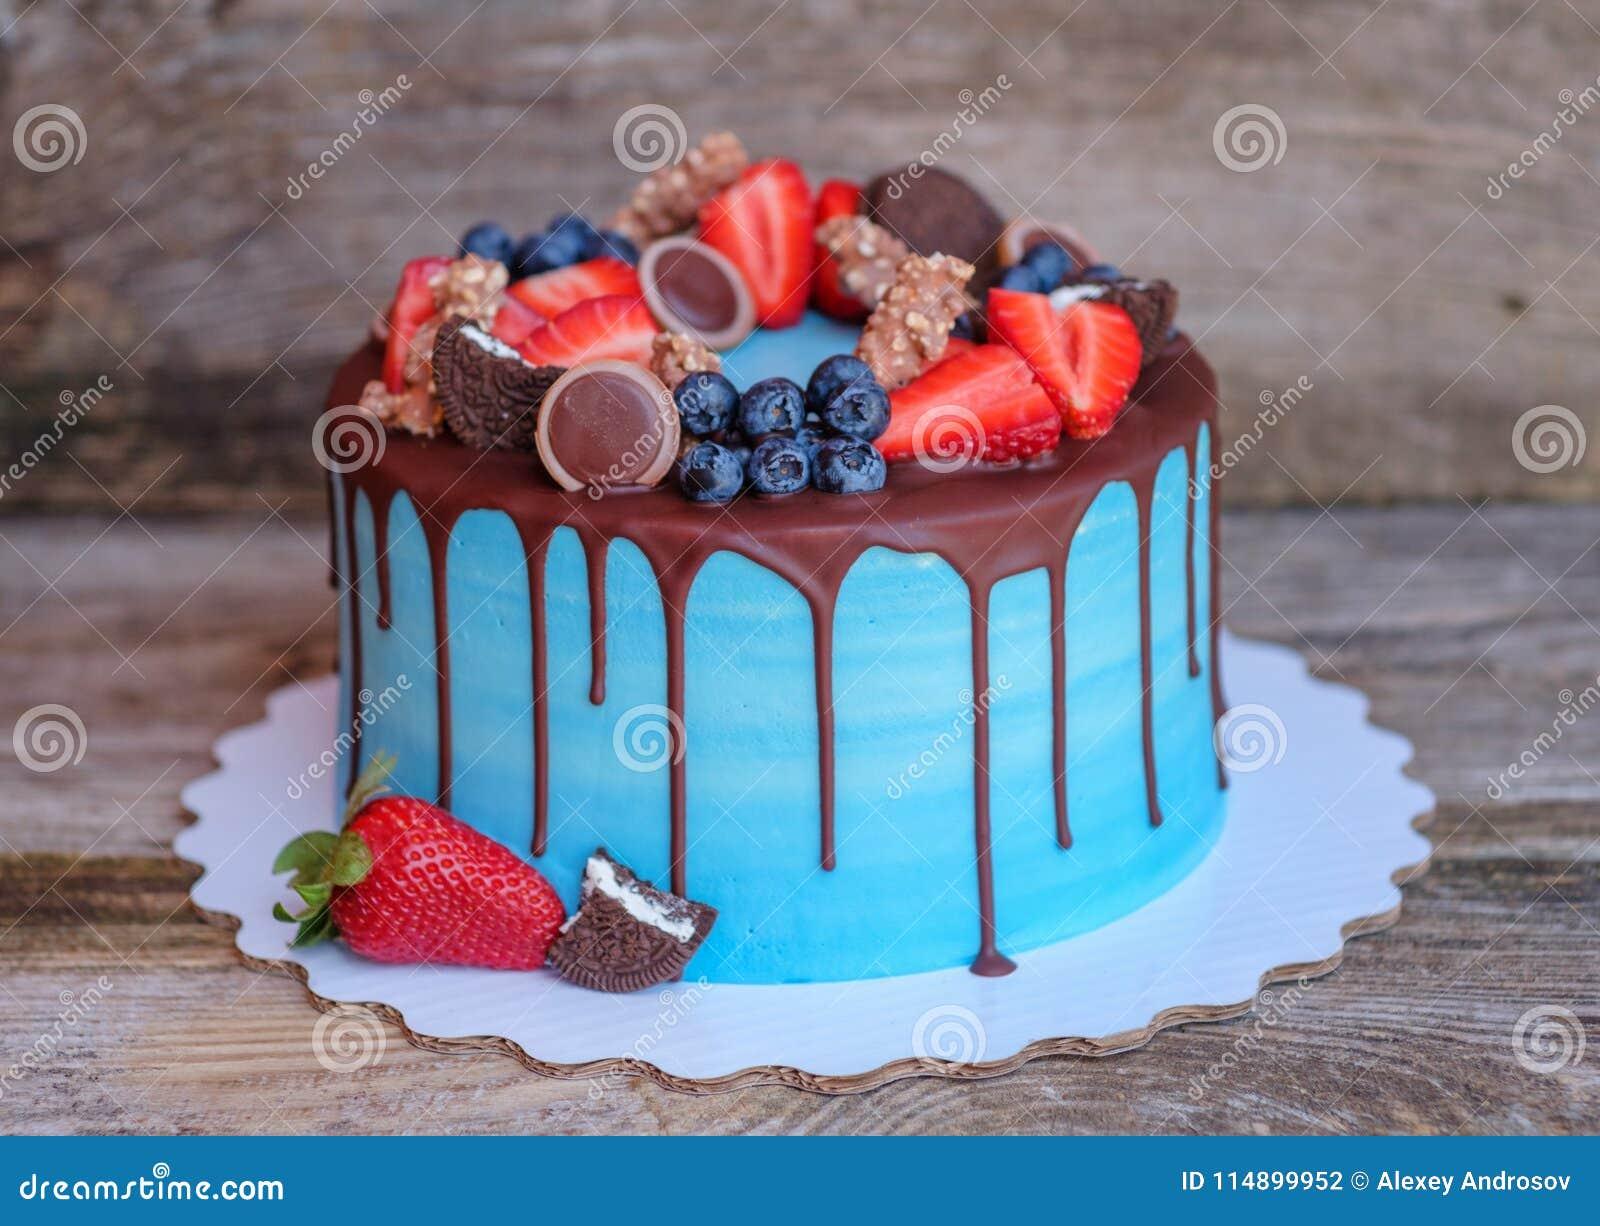 Beautiful Homemade Cake With Blue Cream And Chocolate Glaze